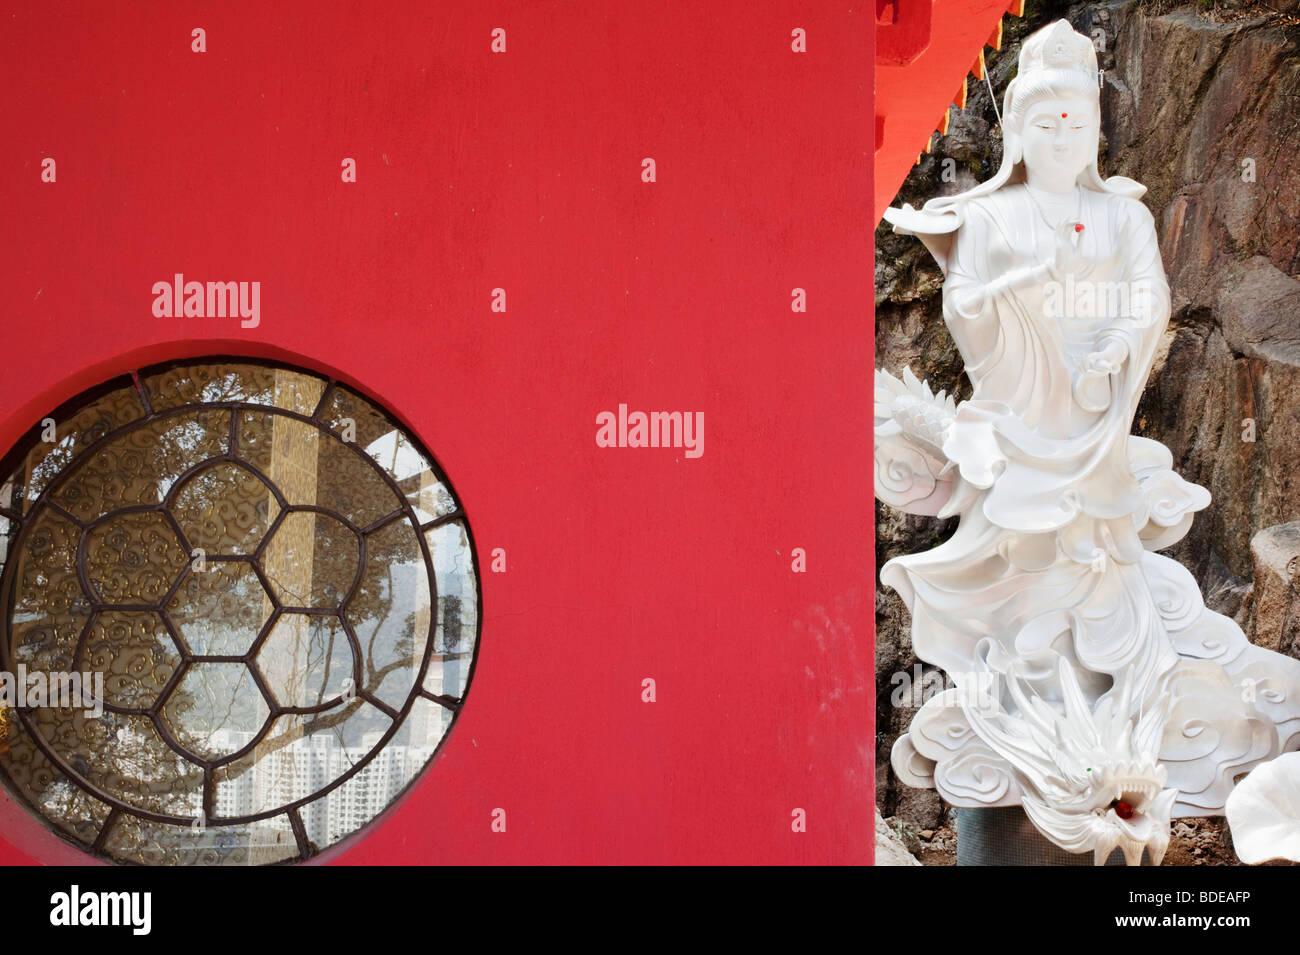 Ten Thousand Buddhas Temple in Sha Tin, Hong Kong, China. - Stock Image